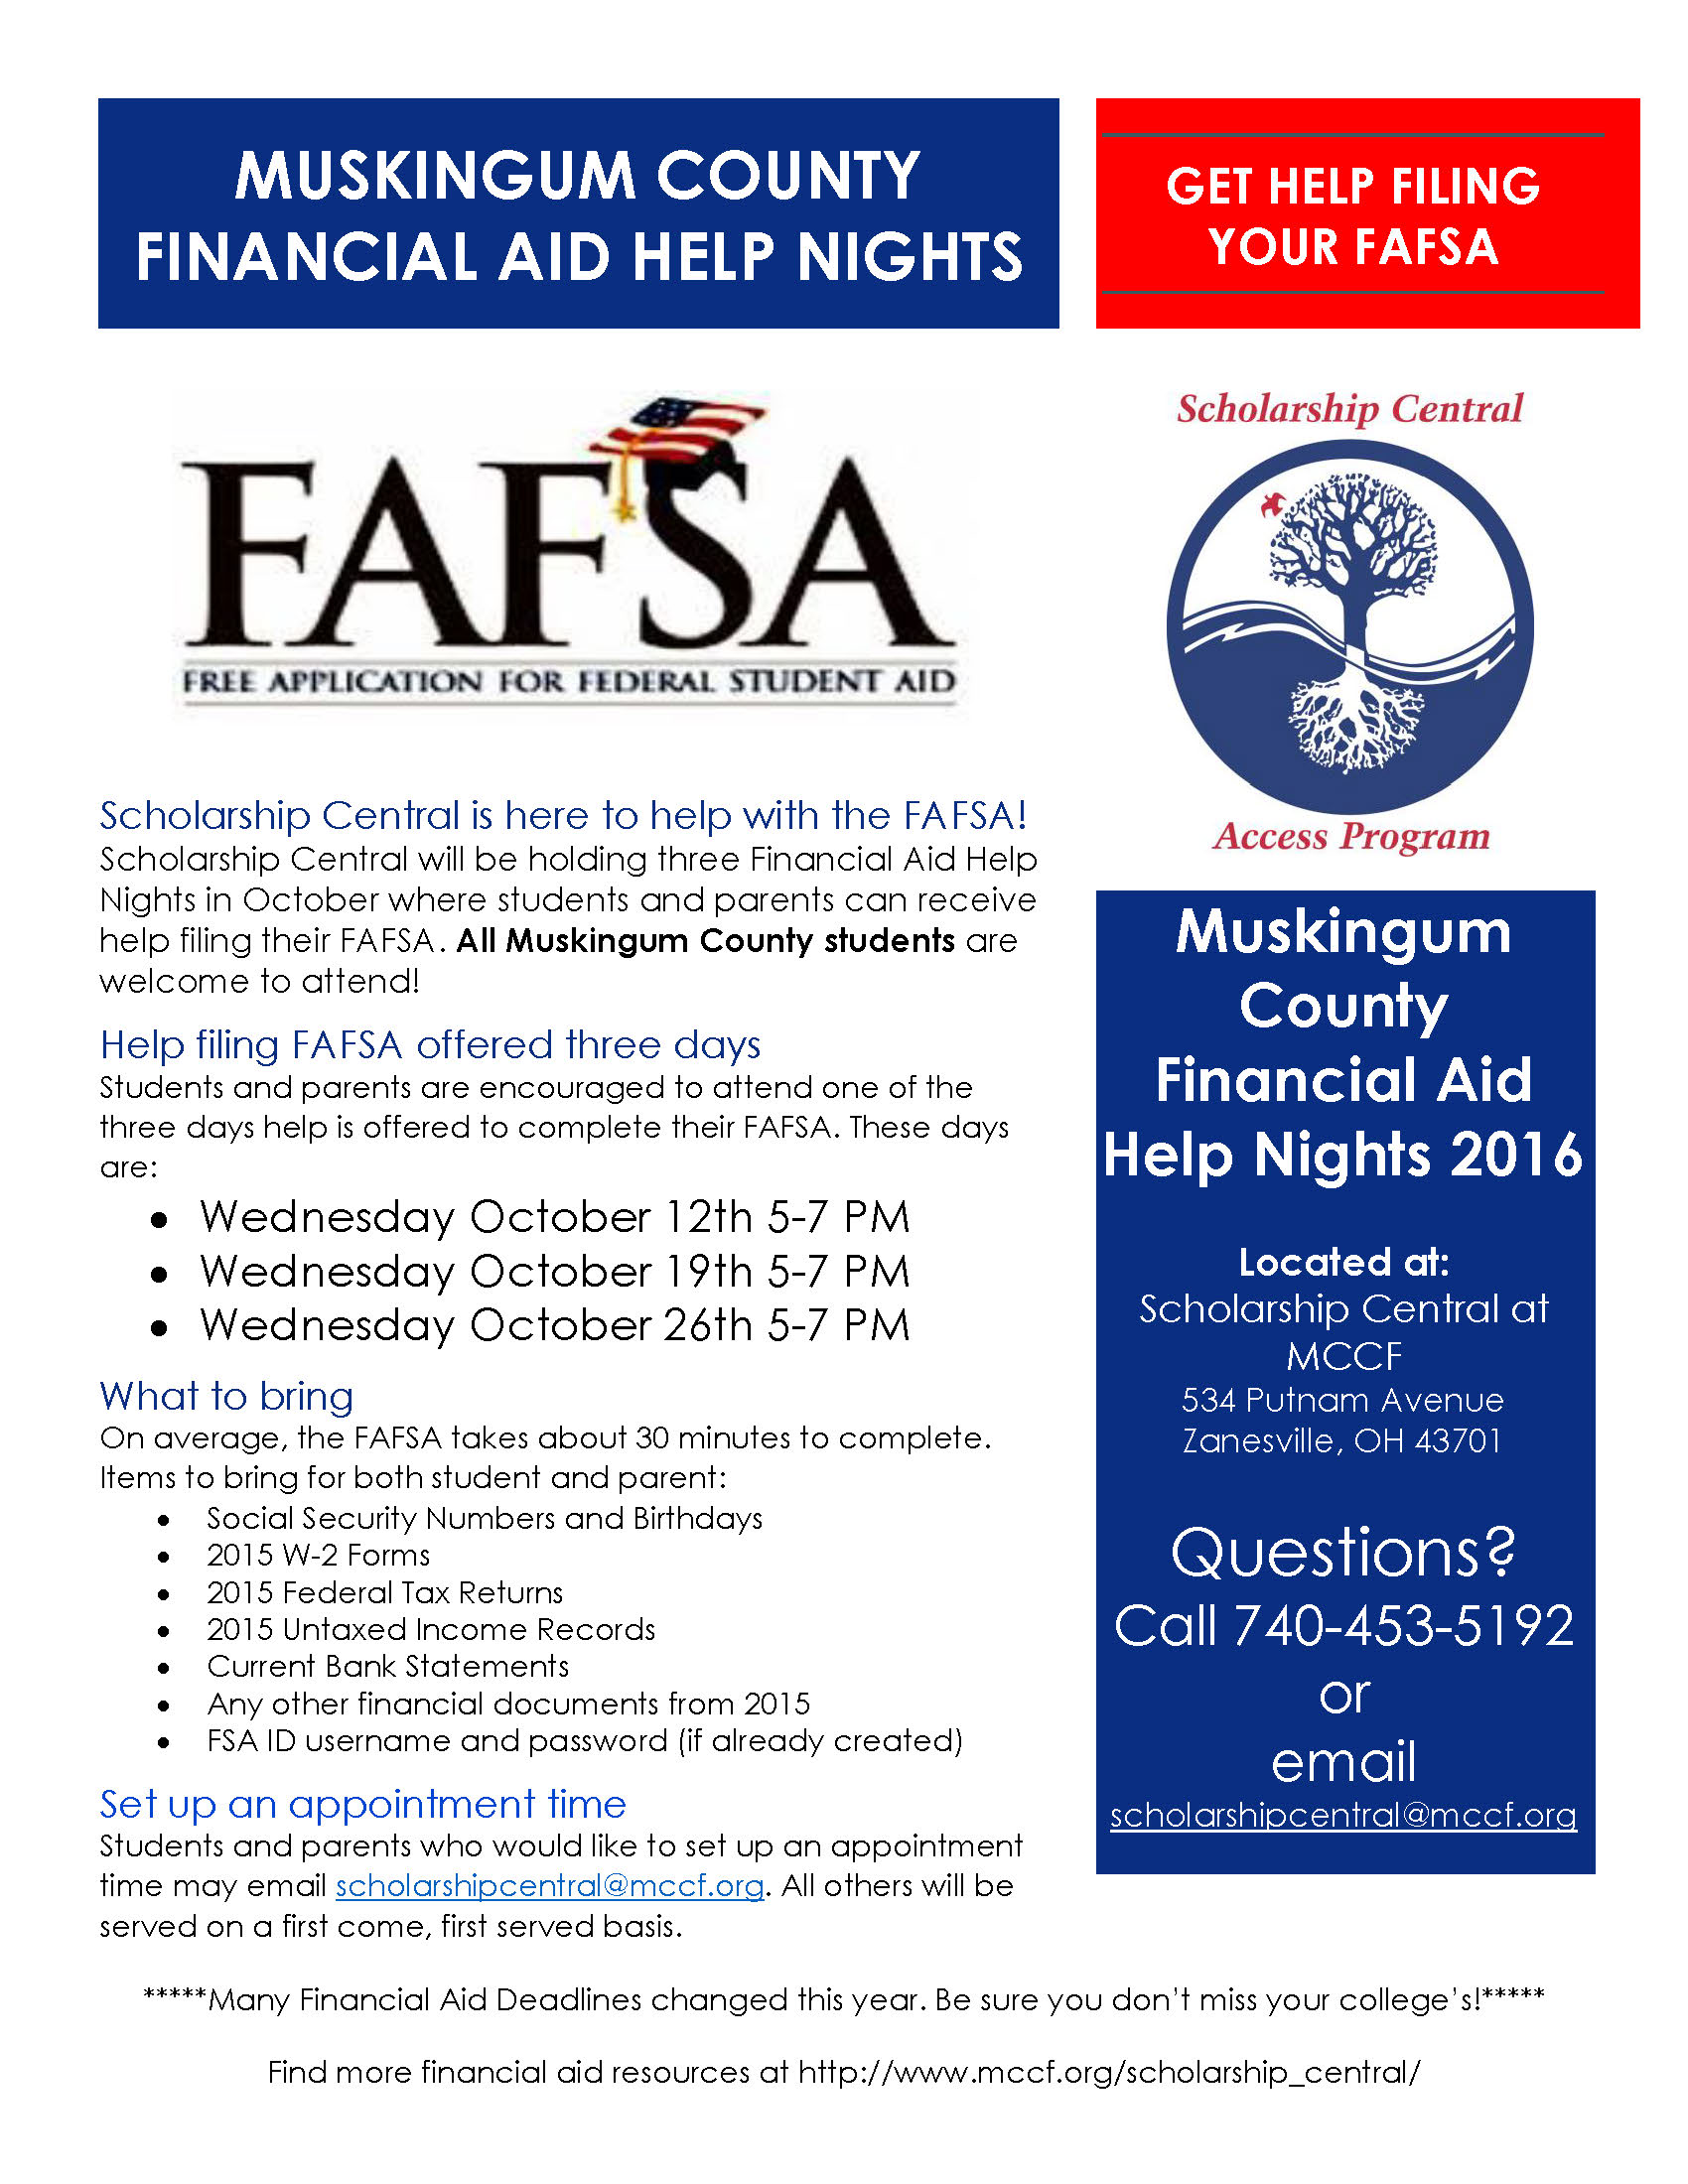 FAFSA Help Nights - Scholarship Central